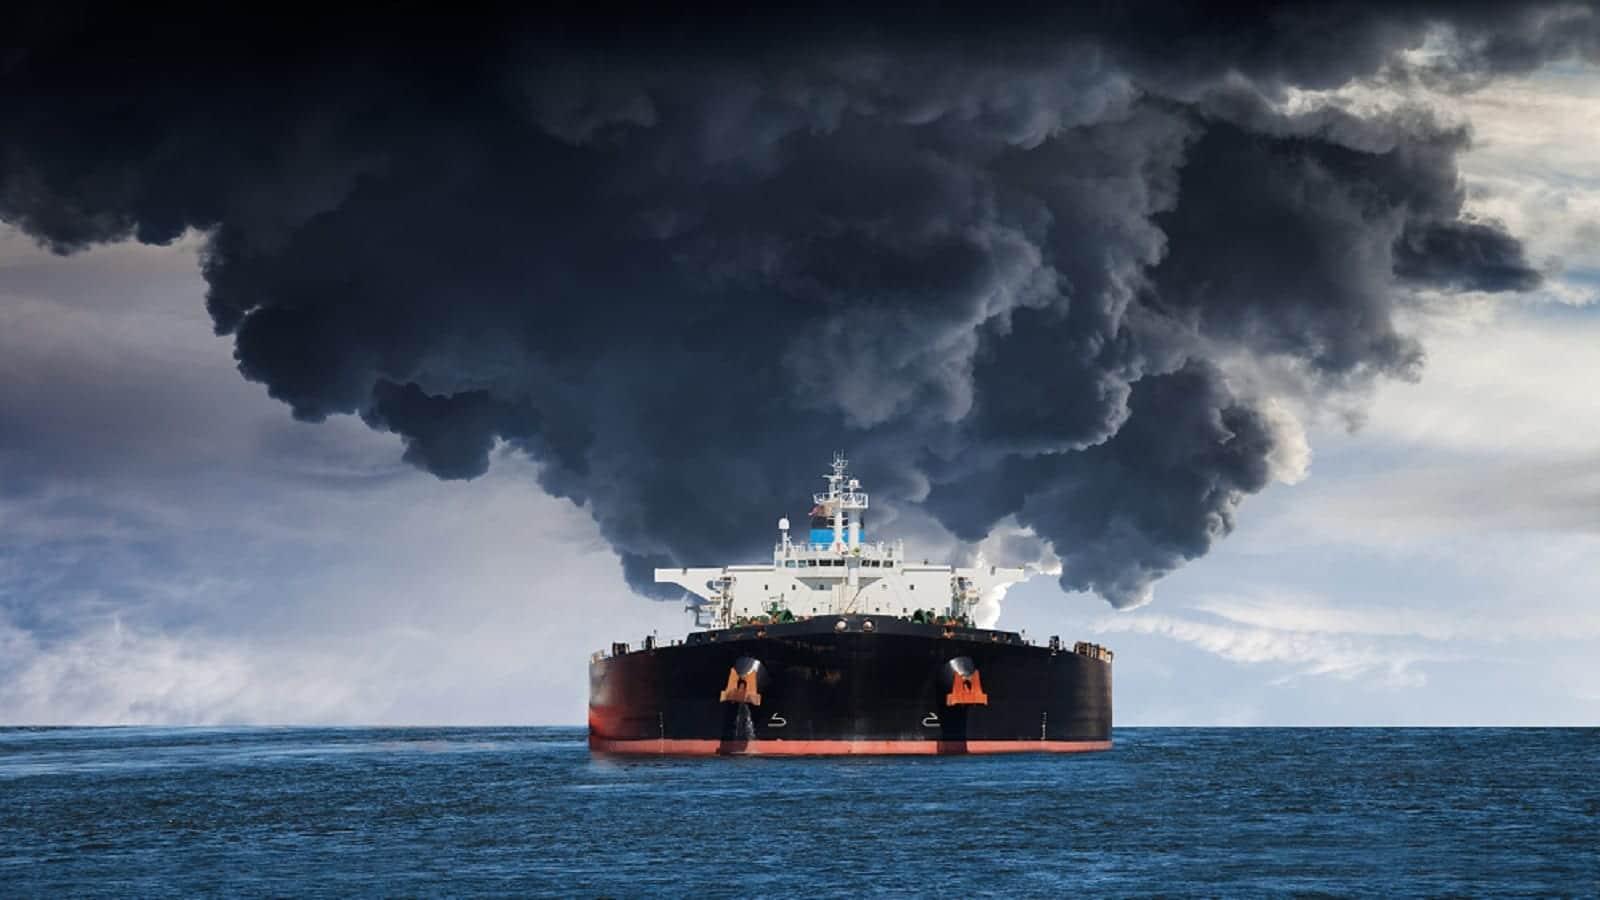 Burning Tanker Ship Stock Photo